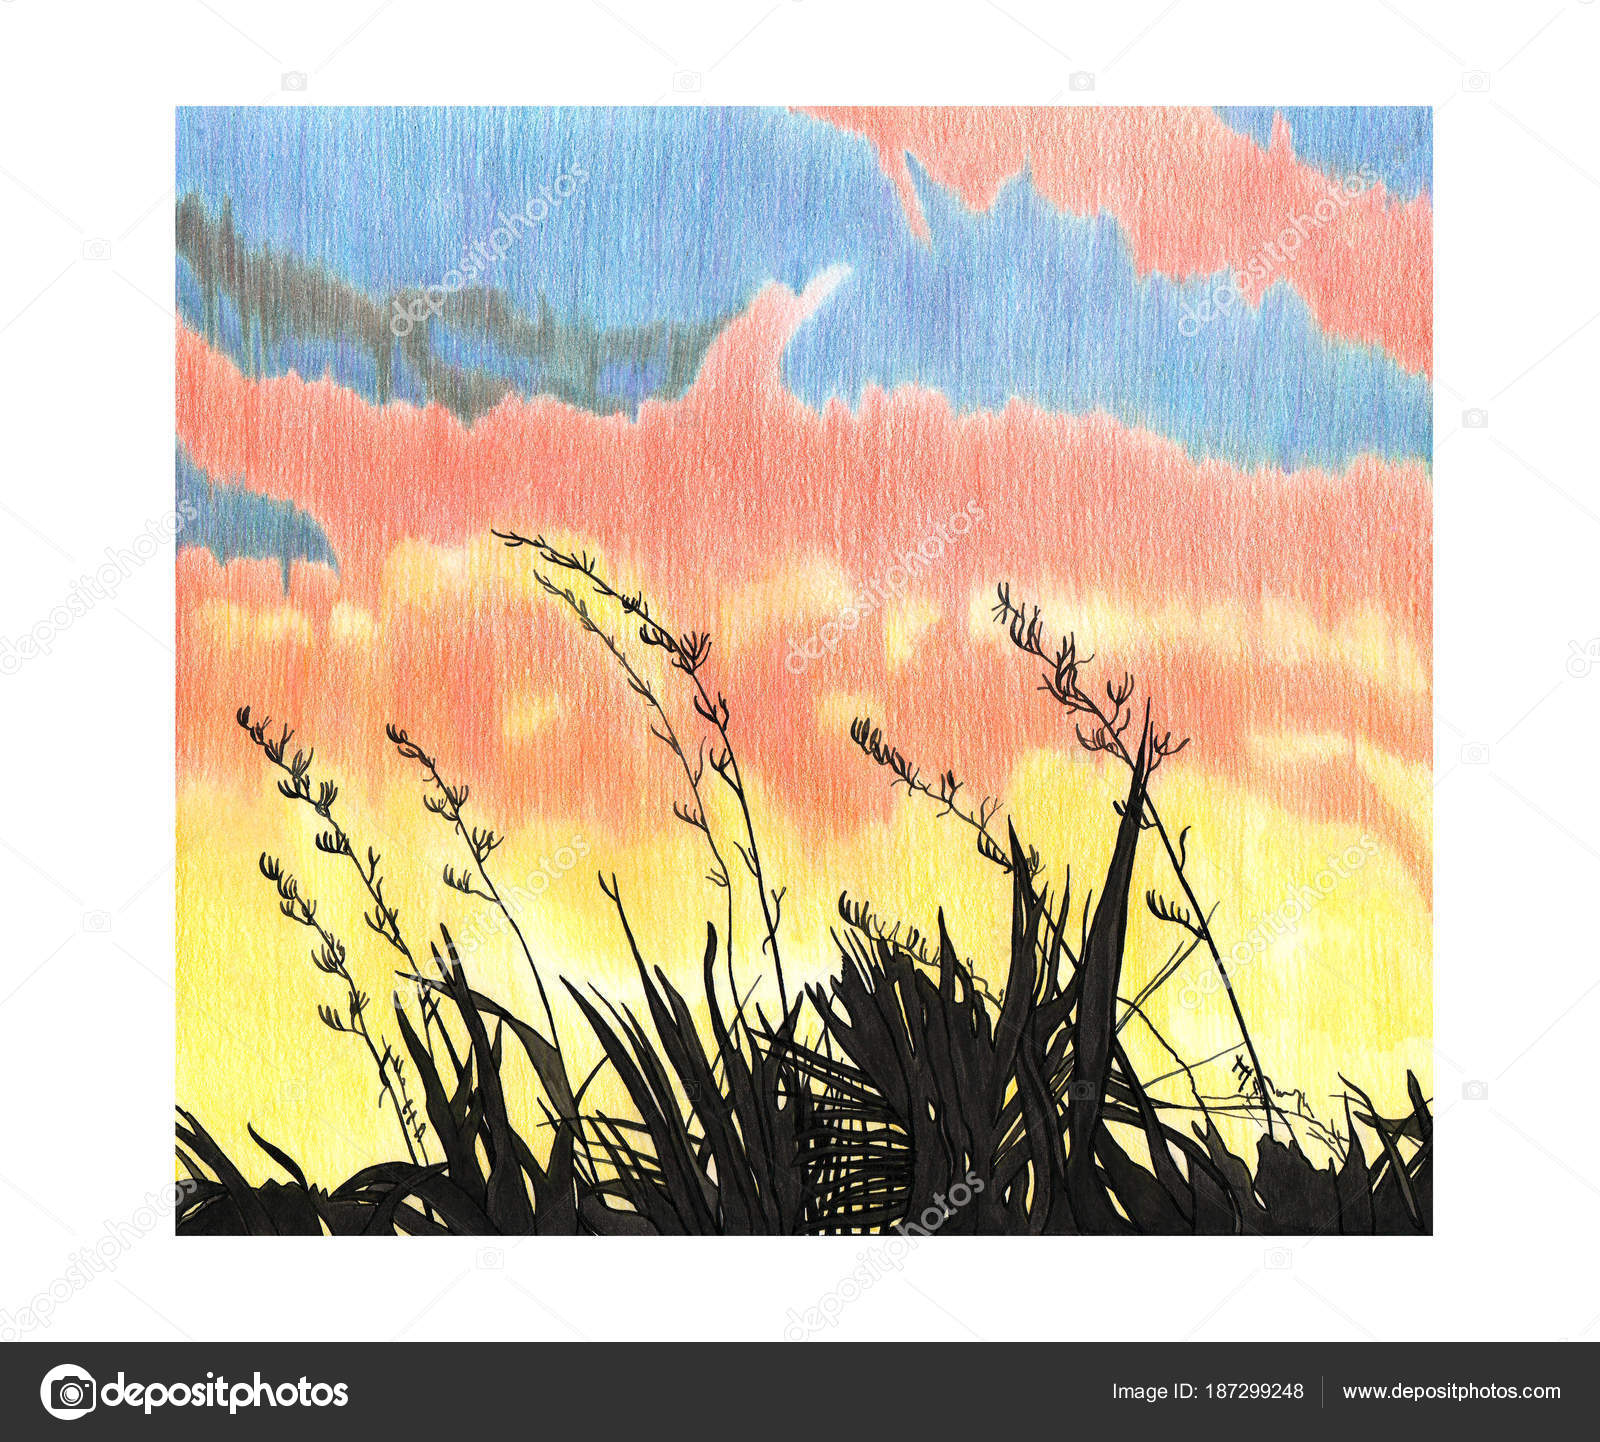 Rucni Kresleni Obrazek Zapadu Slunce Obloha A Rostliny Stock